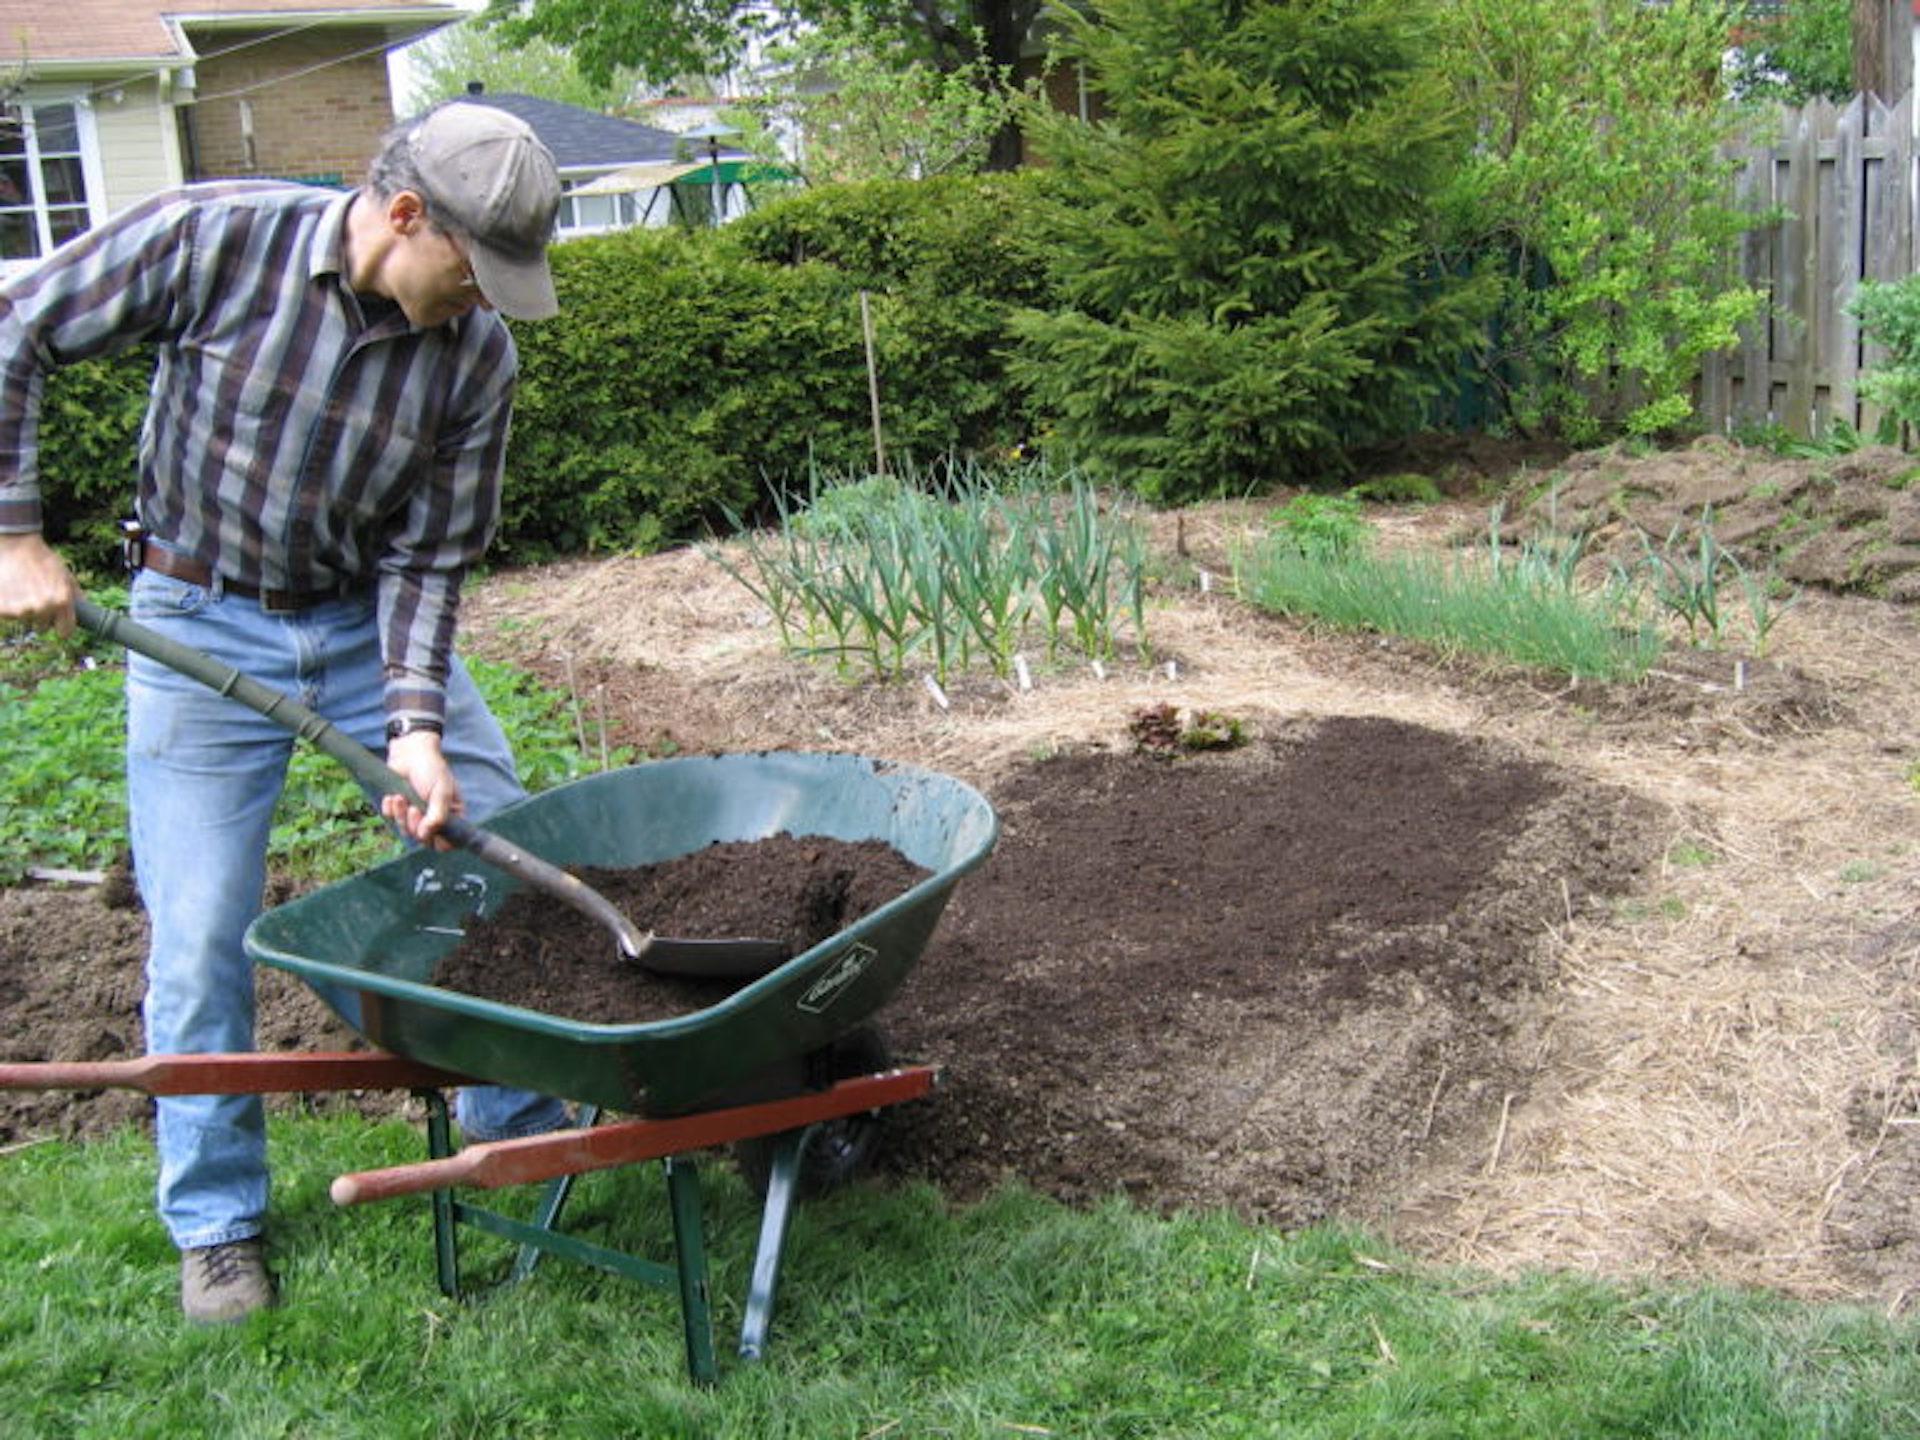 Man shoveling compost from a wheelbarrow.